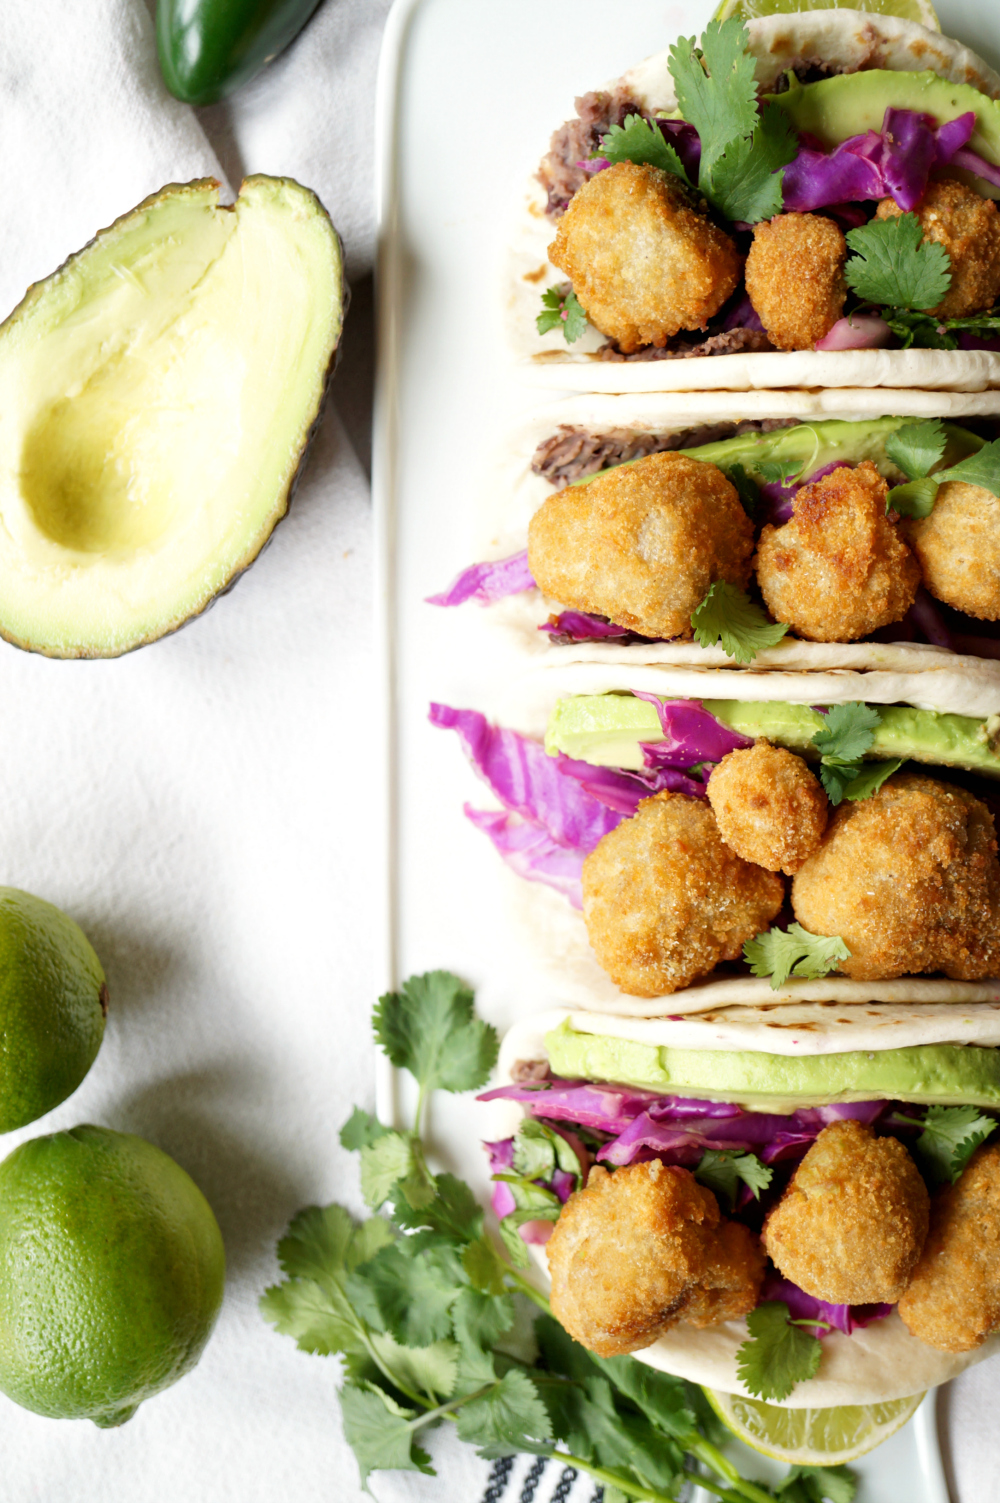 crispy mushroom street tacos with Farm Rich   The Baking Fairy